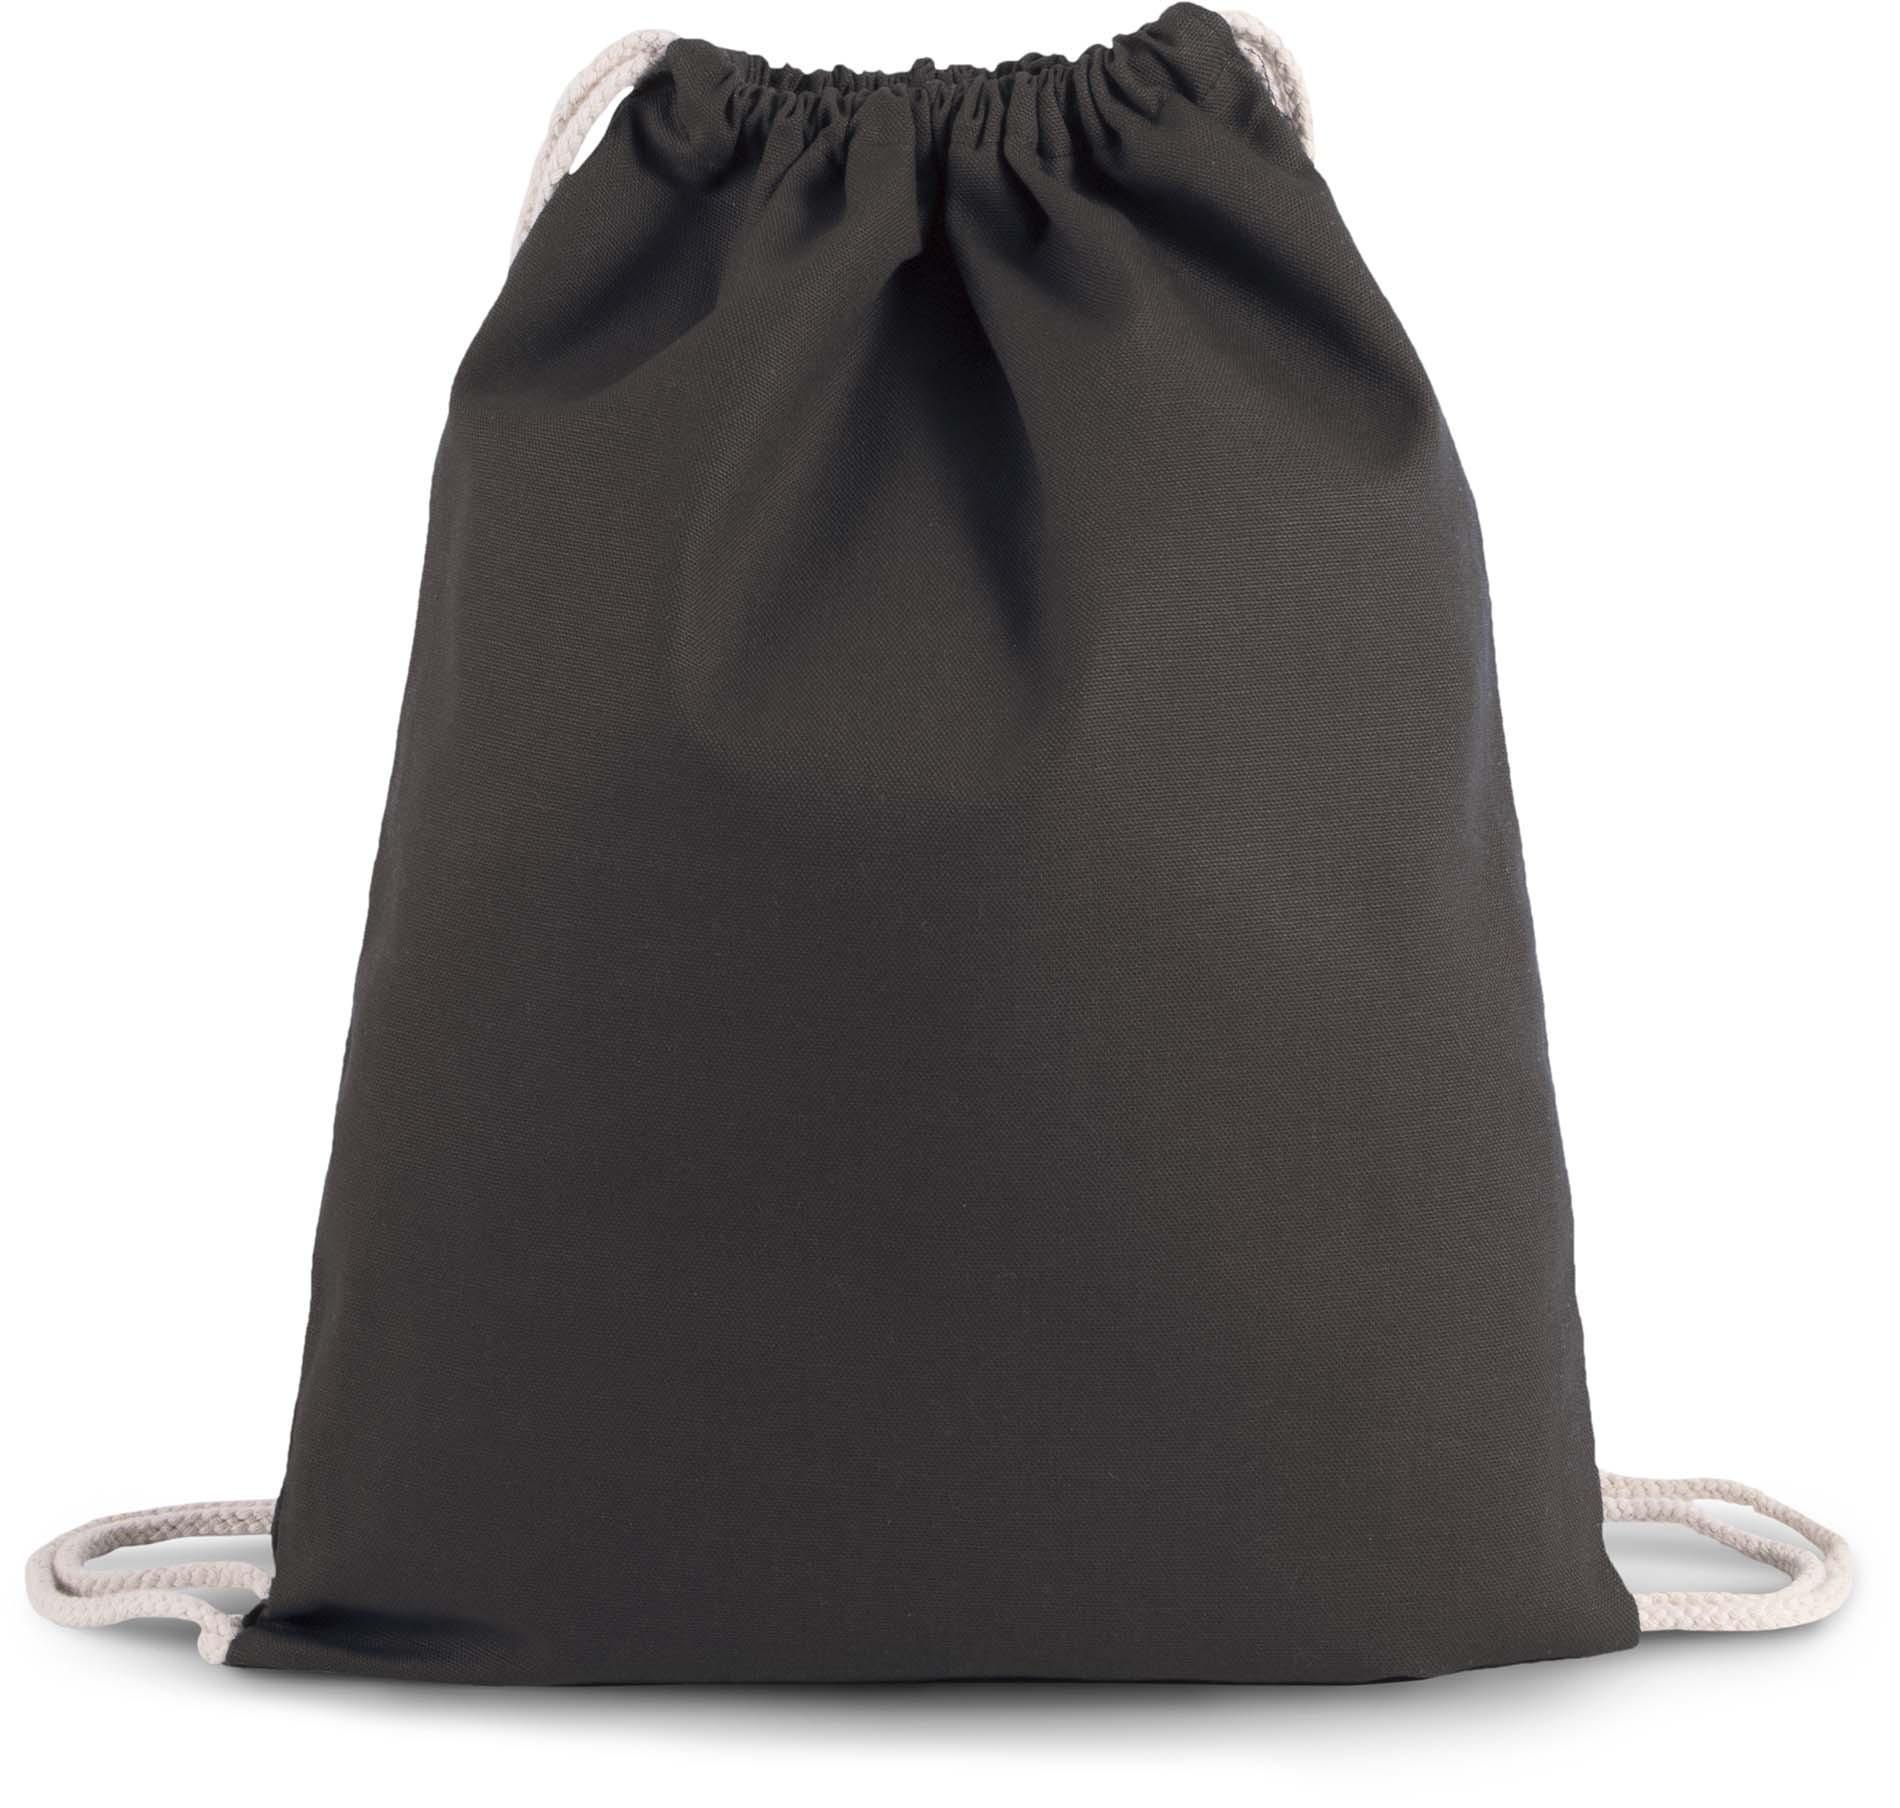 Sac à dos avec cordon épais - 2-1632-7